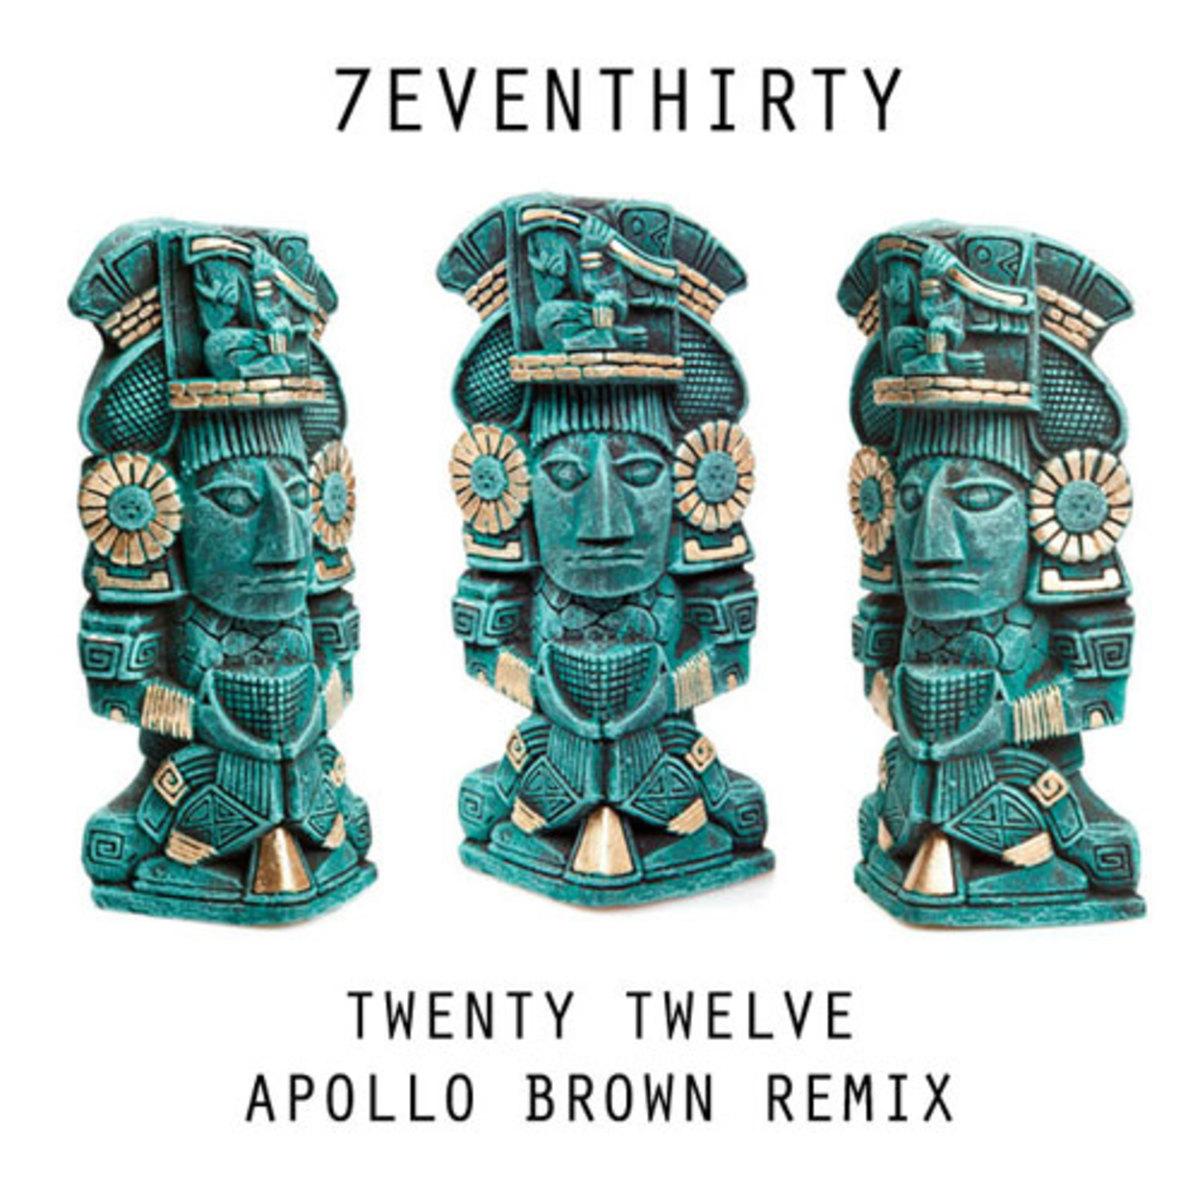 7eventhirty-twentytwelve.jpg